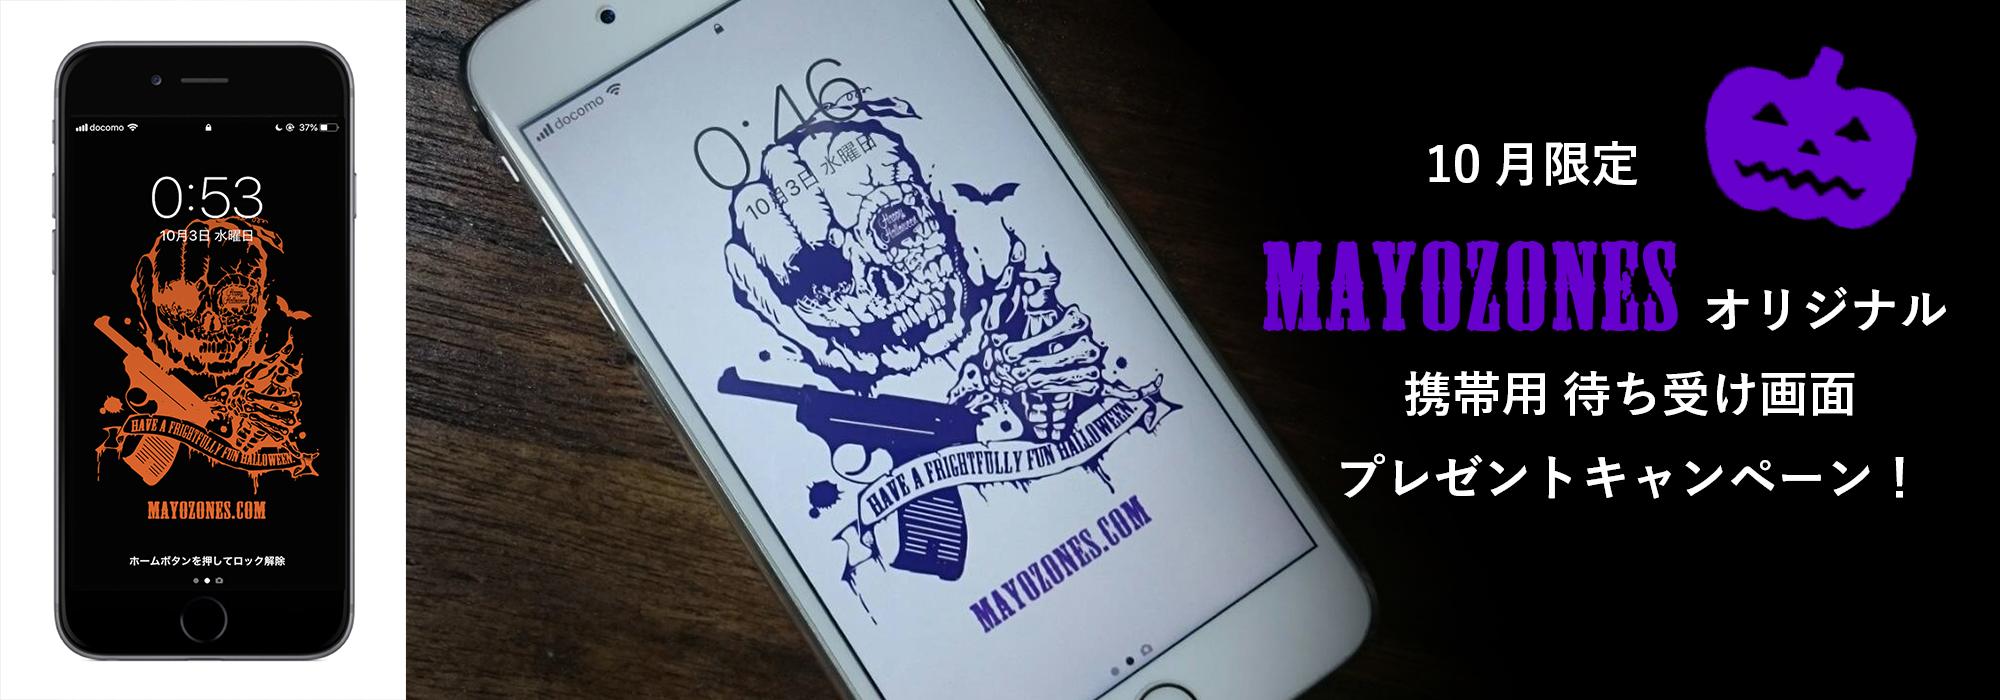 MAYOZONES オリジナル 携帯用待ち受け画面プレゼントキャンペーン!!10月限定